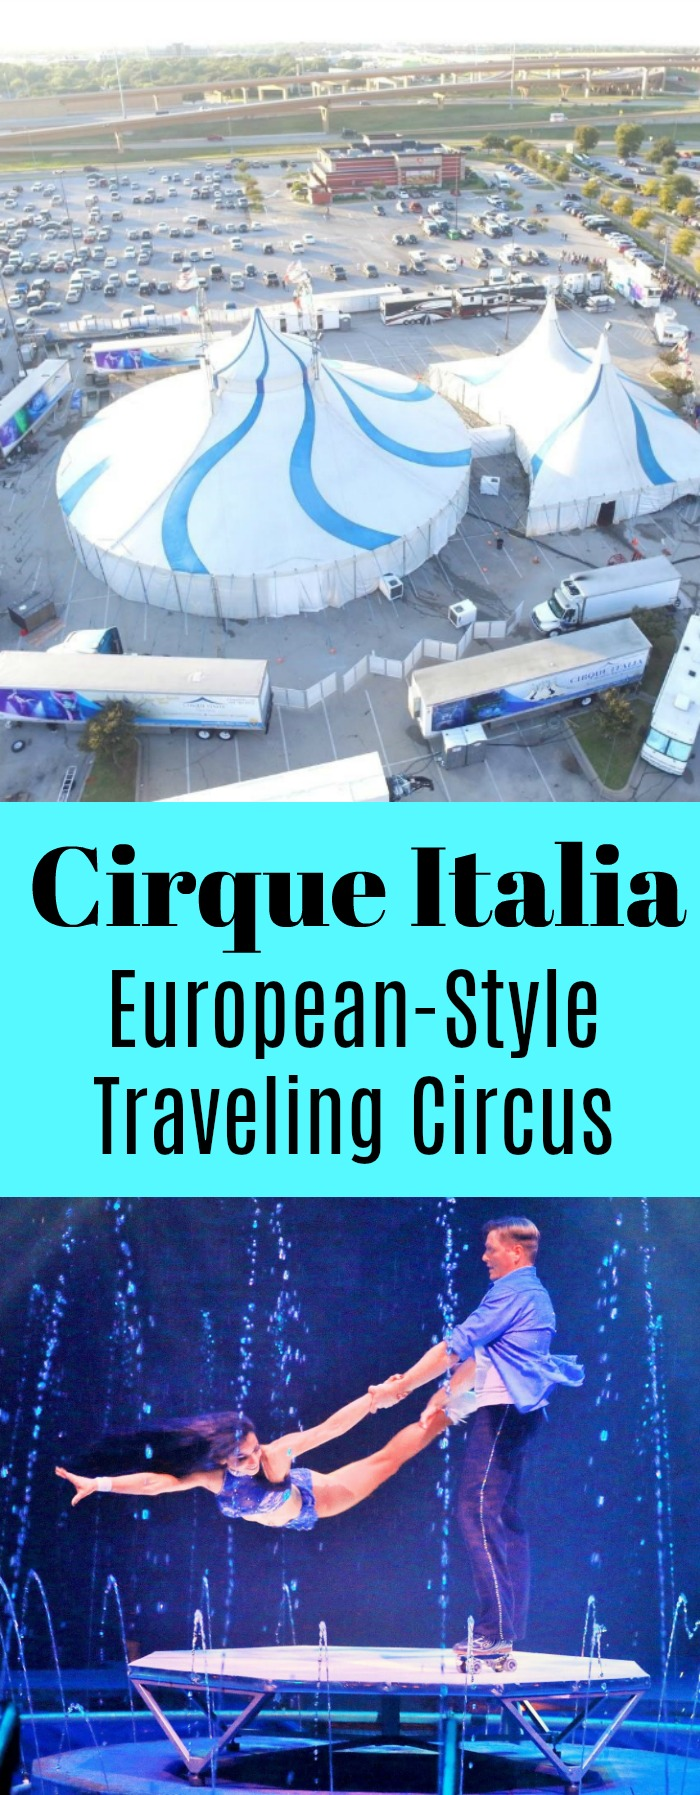 Cirque Italia European Style Traveling Circus